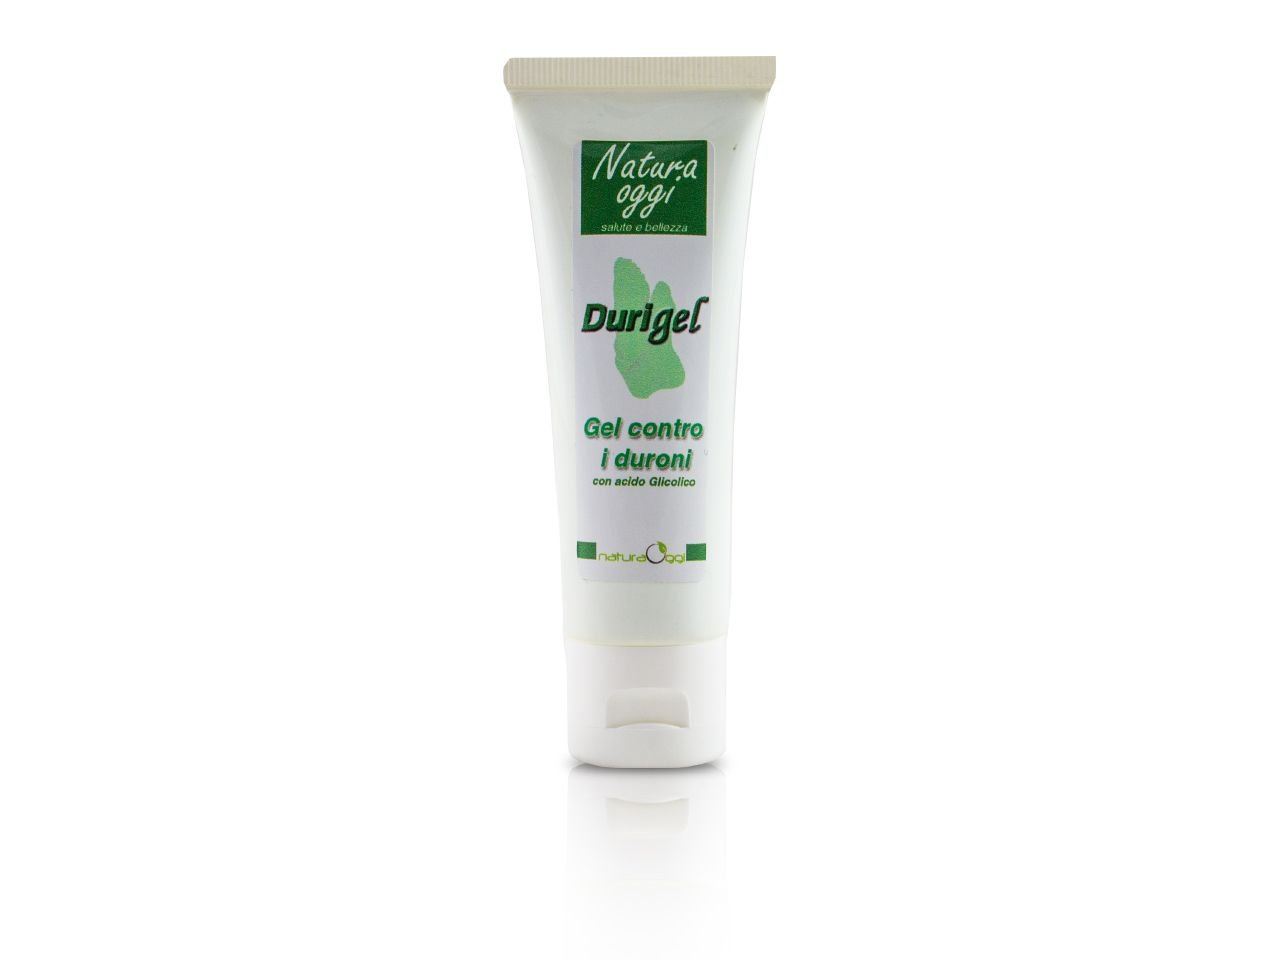 Durigel -1